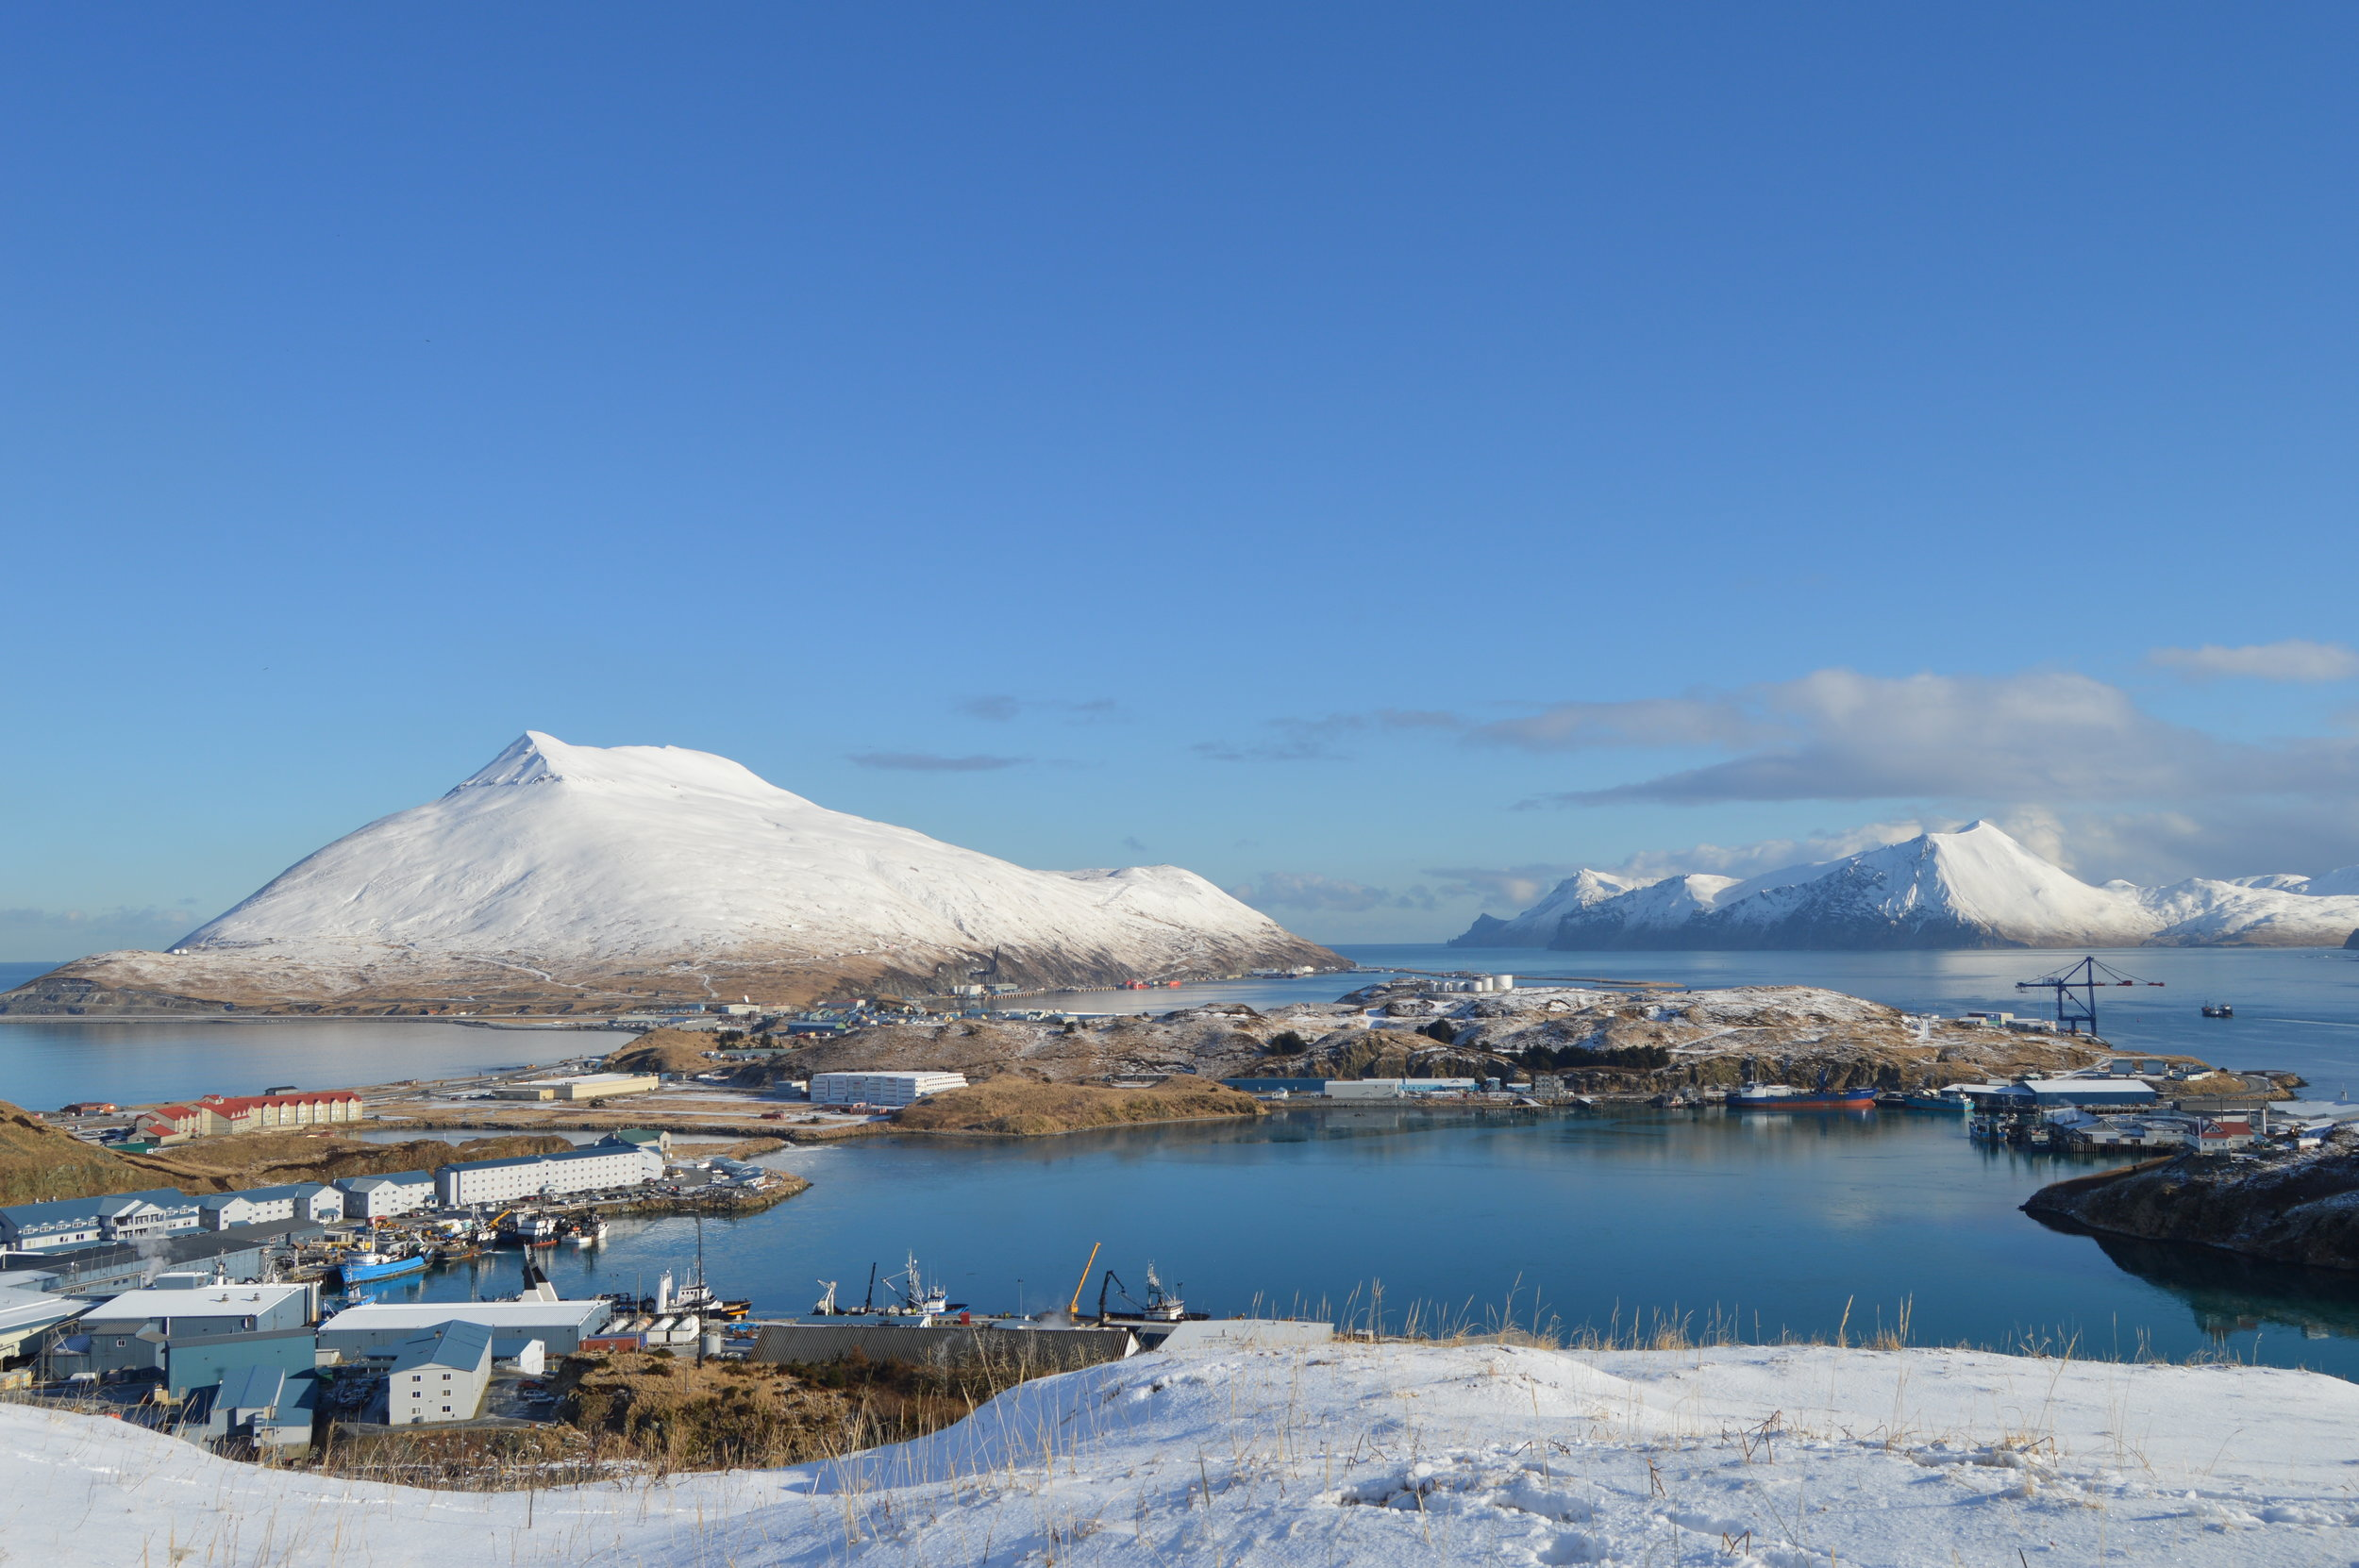 Port of Dutch Harbor in distance, city of Unalaska, Margaret Bay in foreground